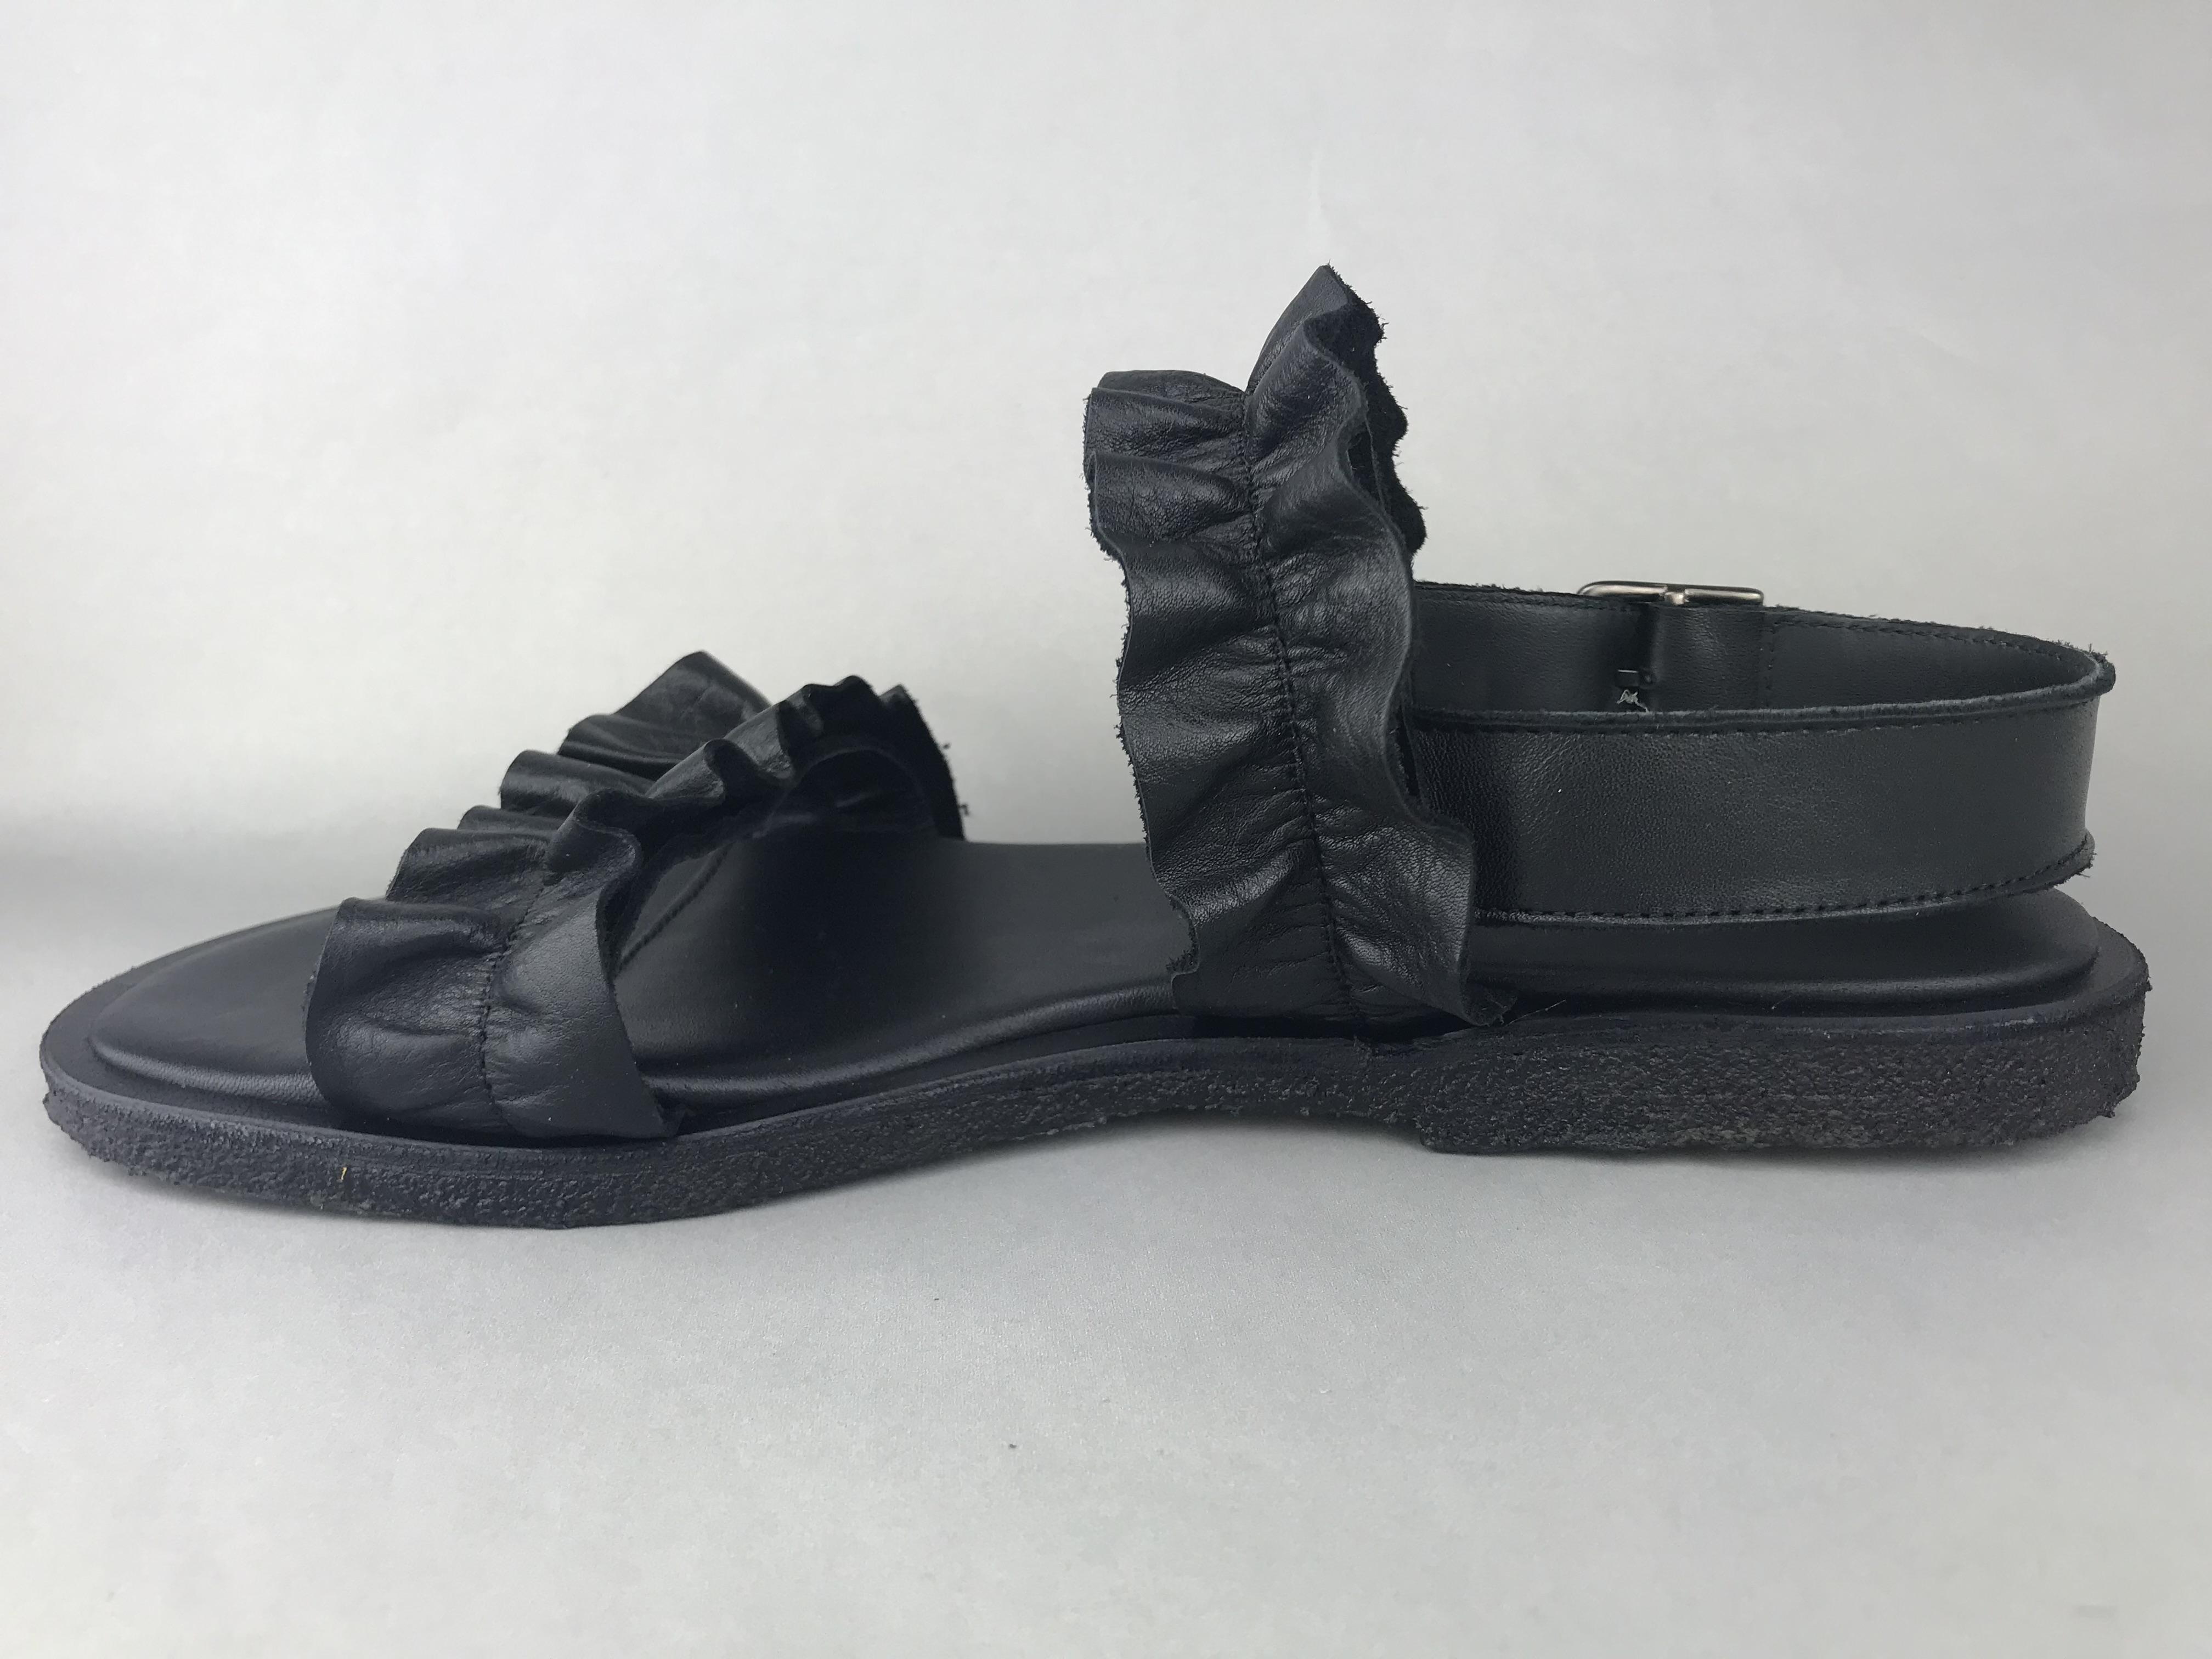 8a6b38c04588 Angulus sandal m. flæse - sort 5558-102 - DAME - zjoos-hjoerring.dk